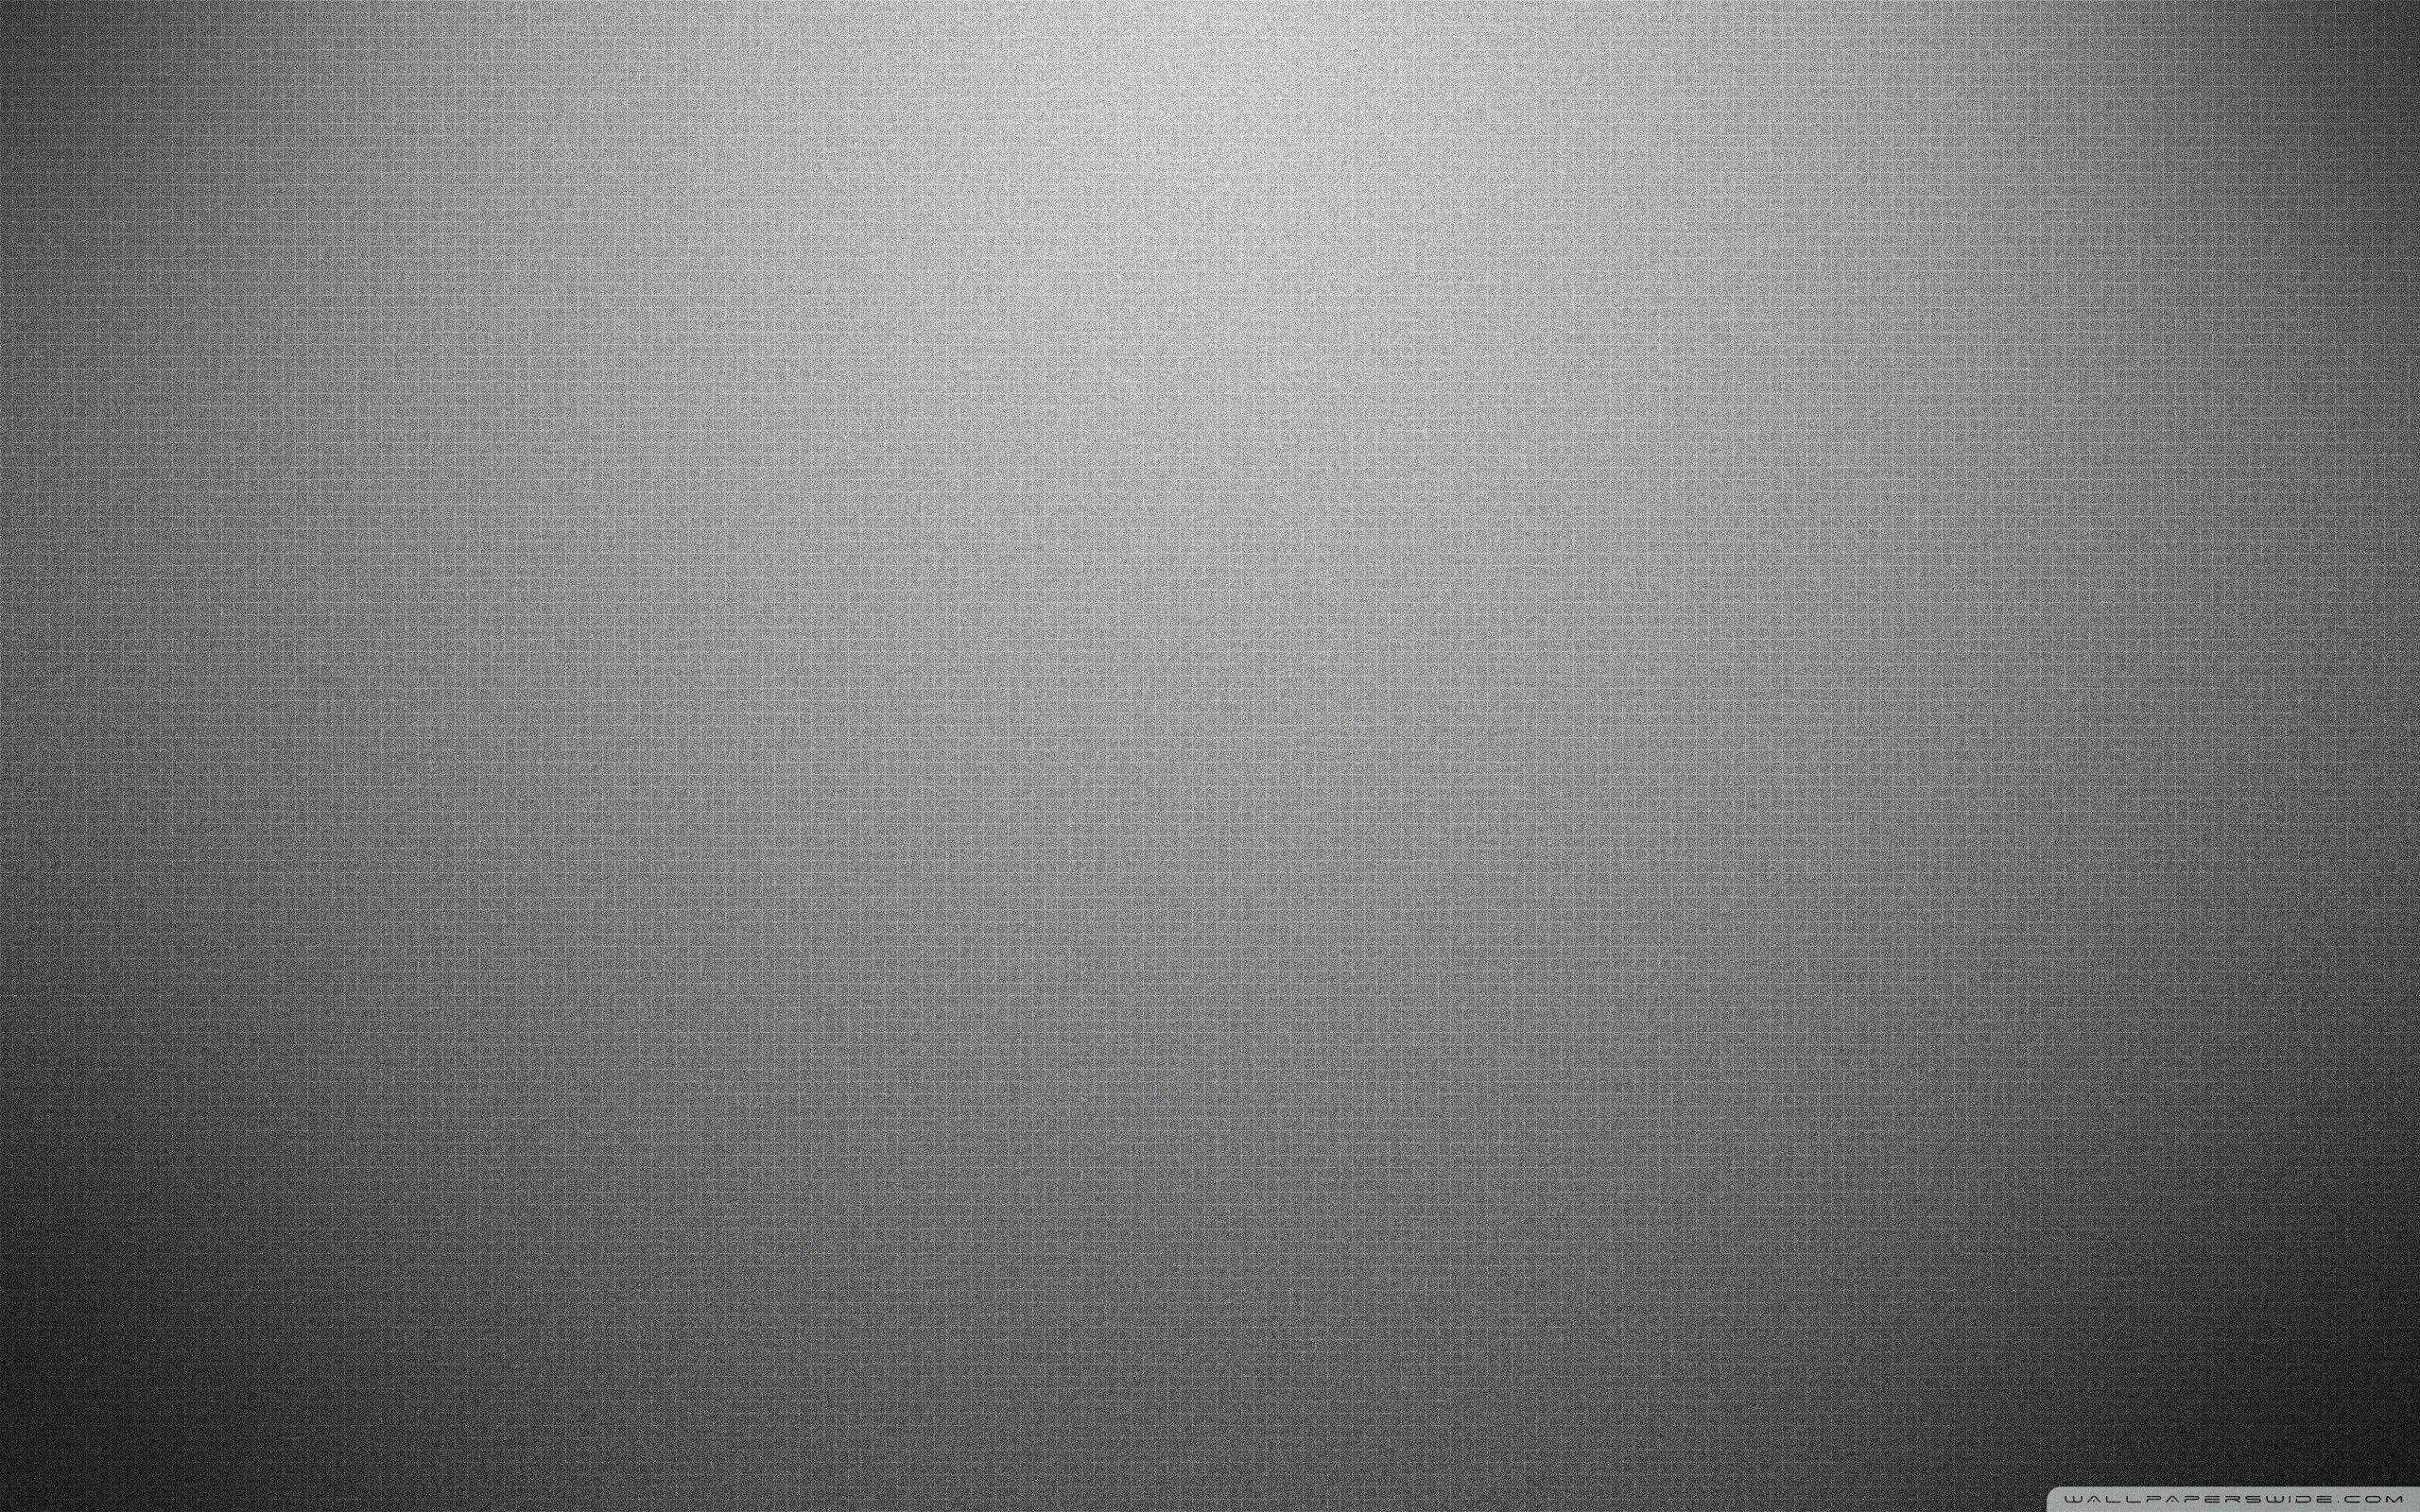 Wallpaper 4k Zen Trick Di 2020 Warna Latar Belakang Abu Abu